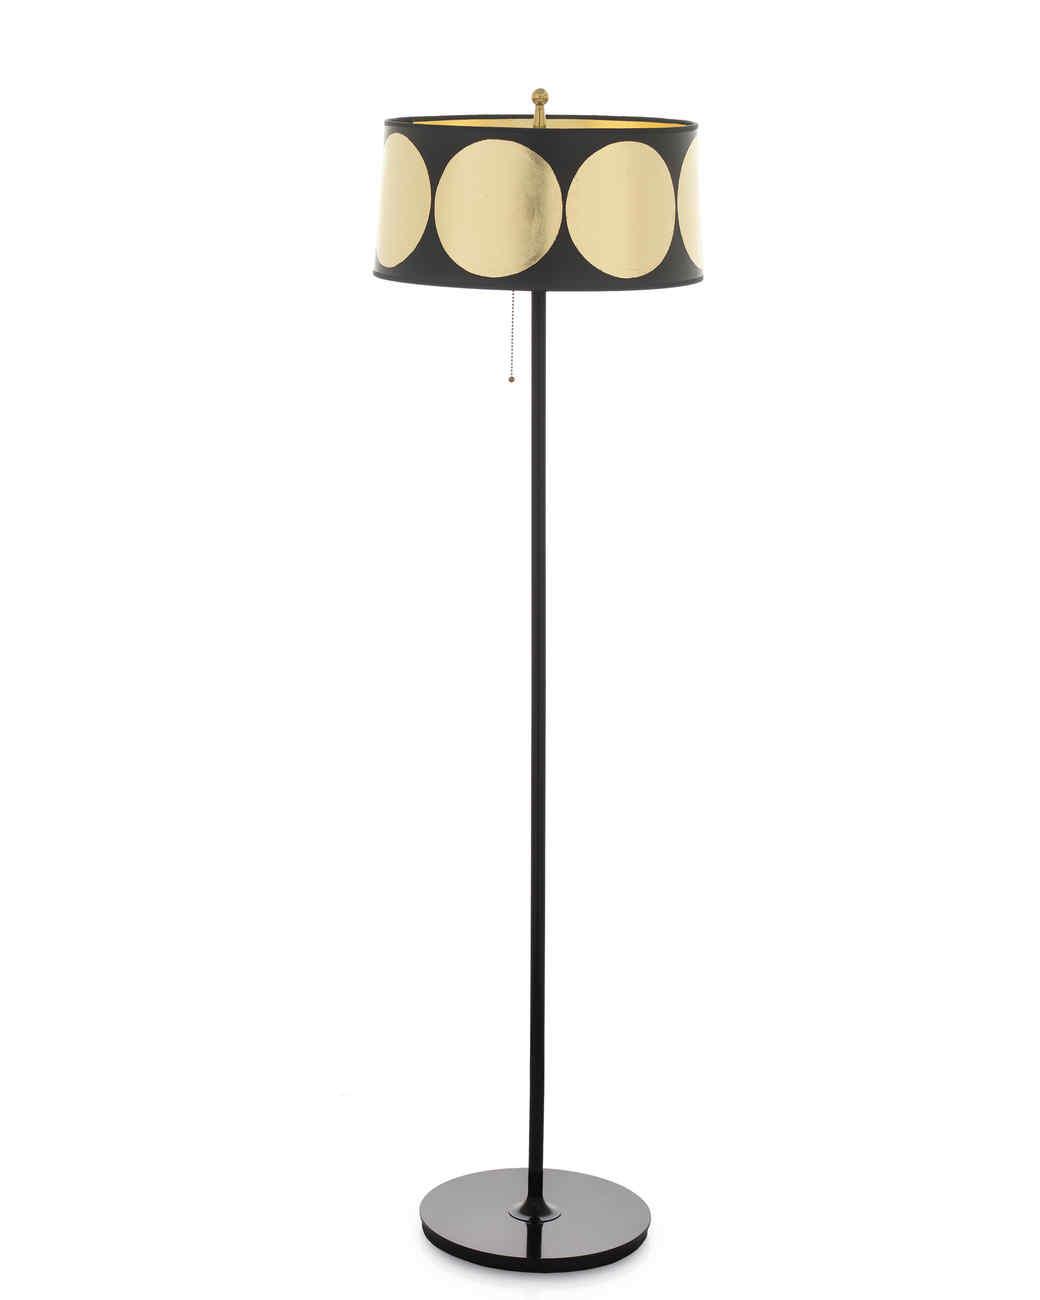 Gilded Floor-Lamp Shade